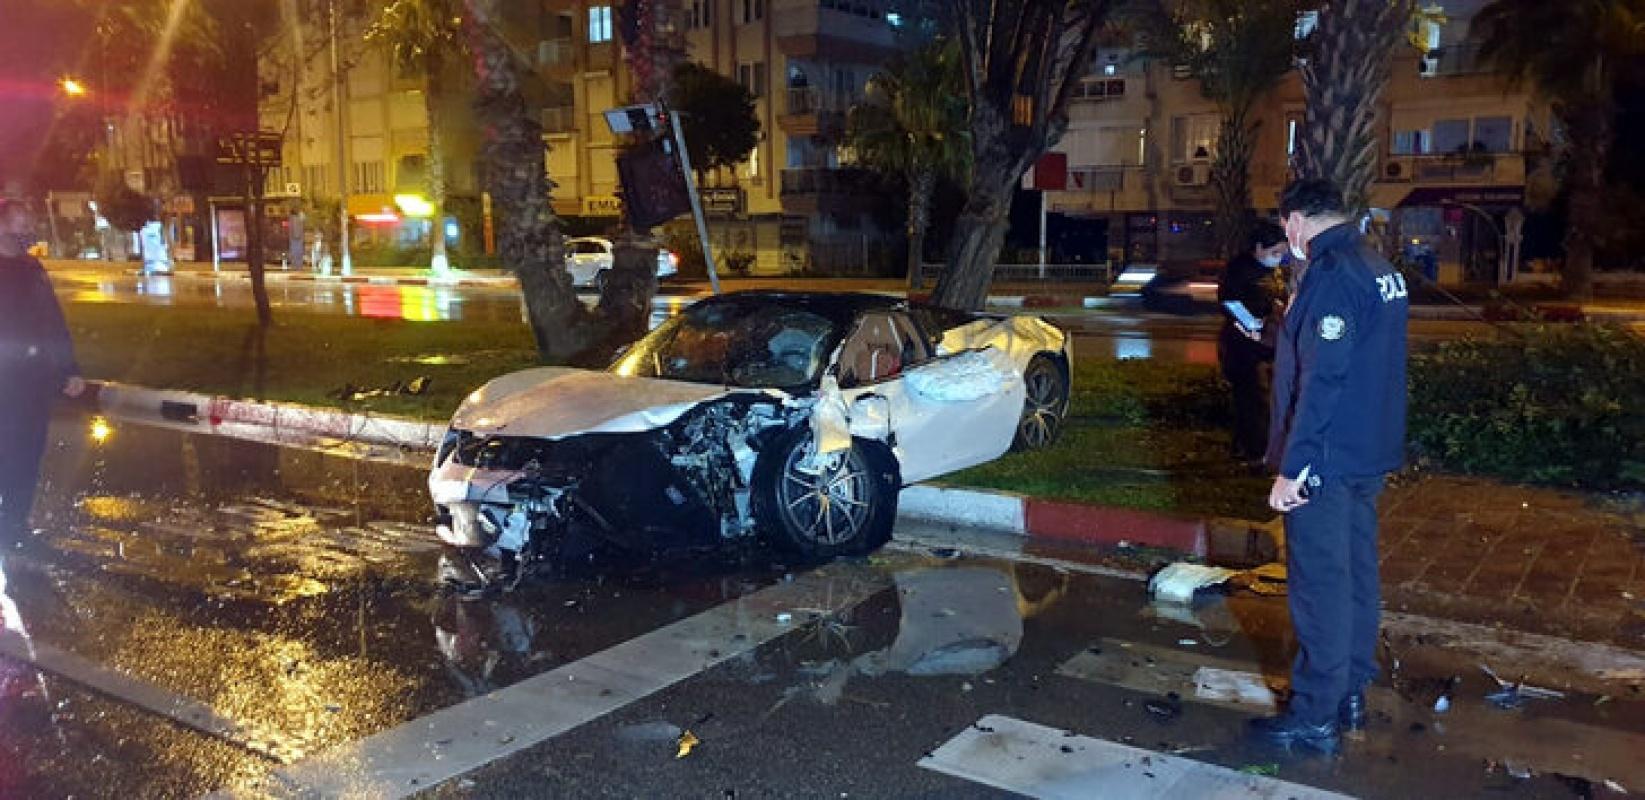 Antalya'da feci kaza 4 milyon liralık araç pert oldu